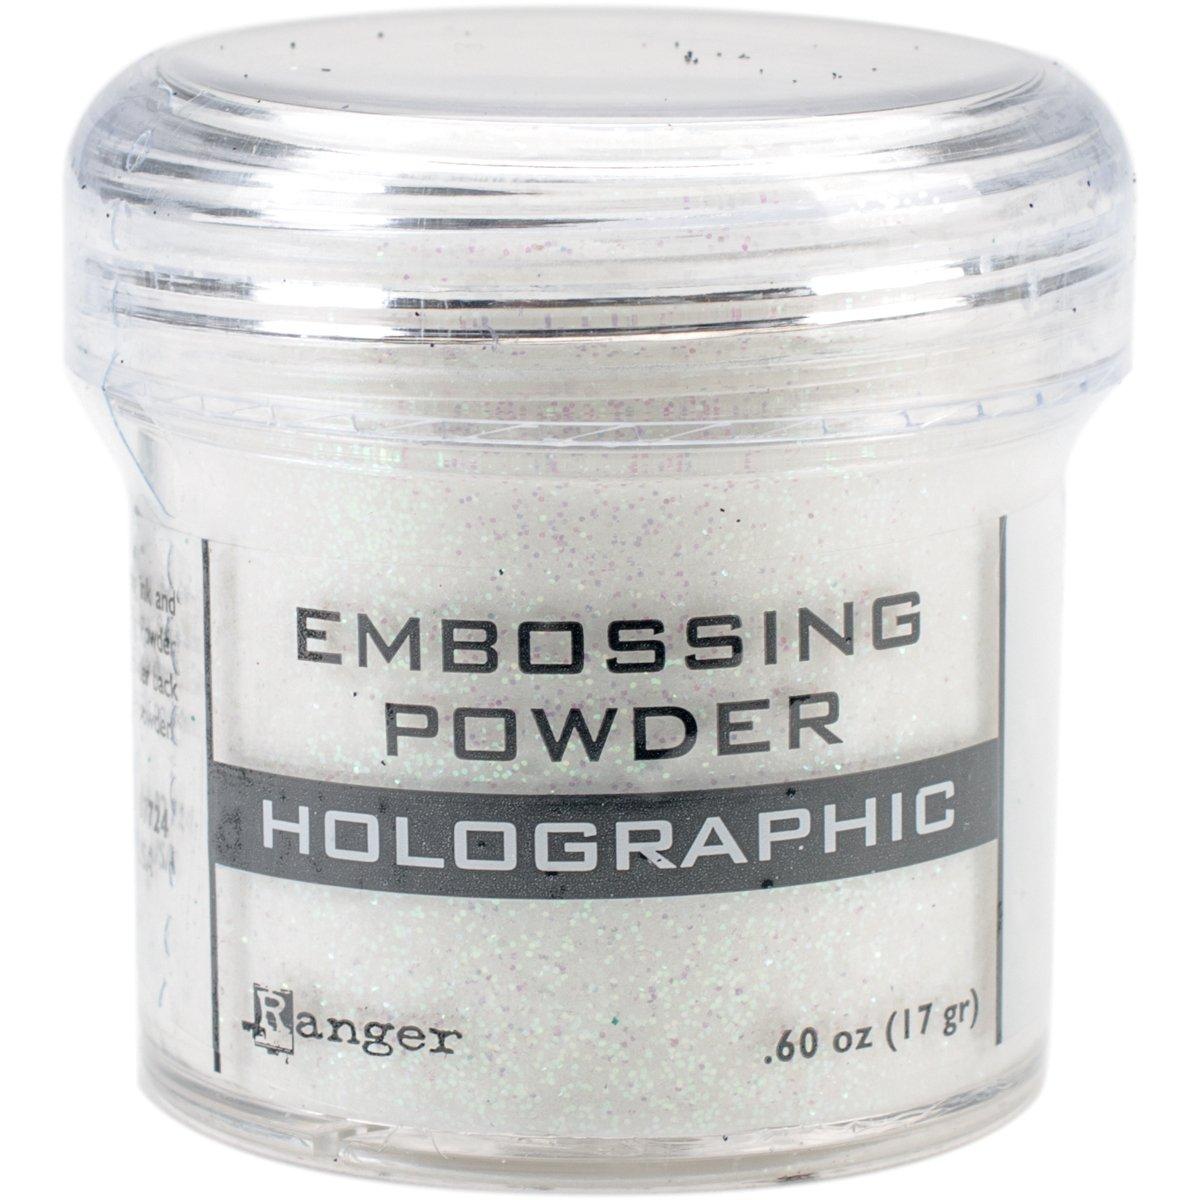 Ranger EPJ00-709 Embossing Powder .60oz, Holographic by Ranger (Image #1)